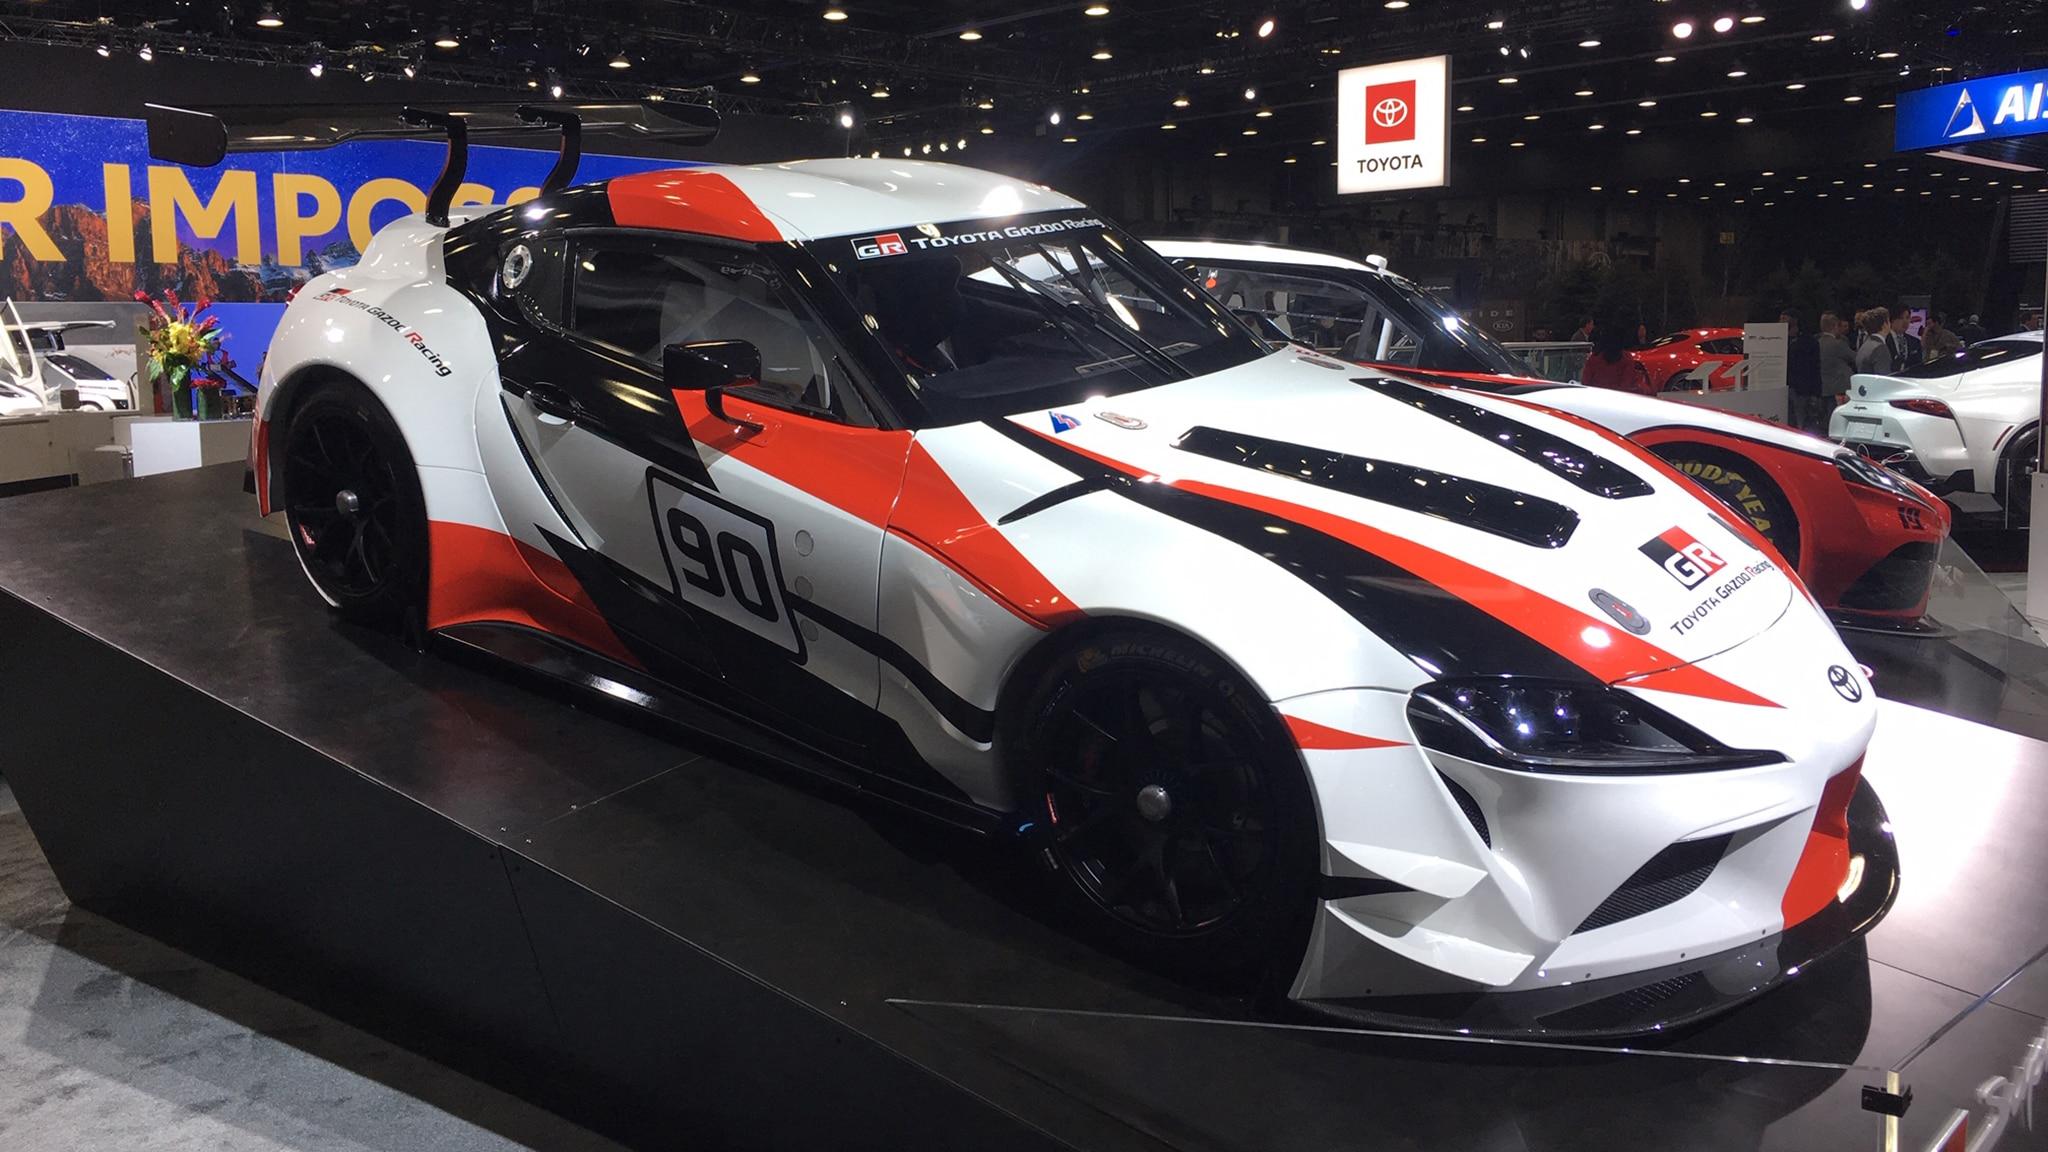 The Race Cars of the 2019 Detroit Auto Show | Automobile